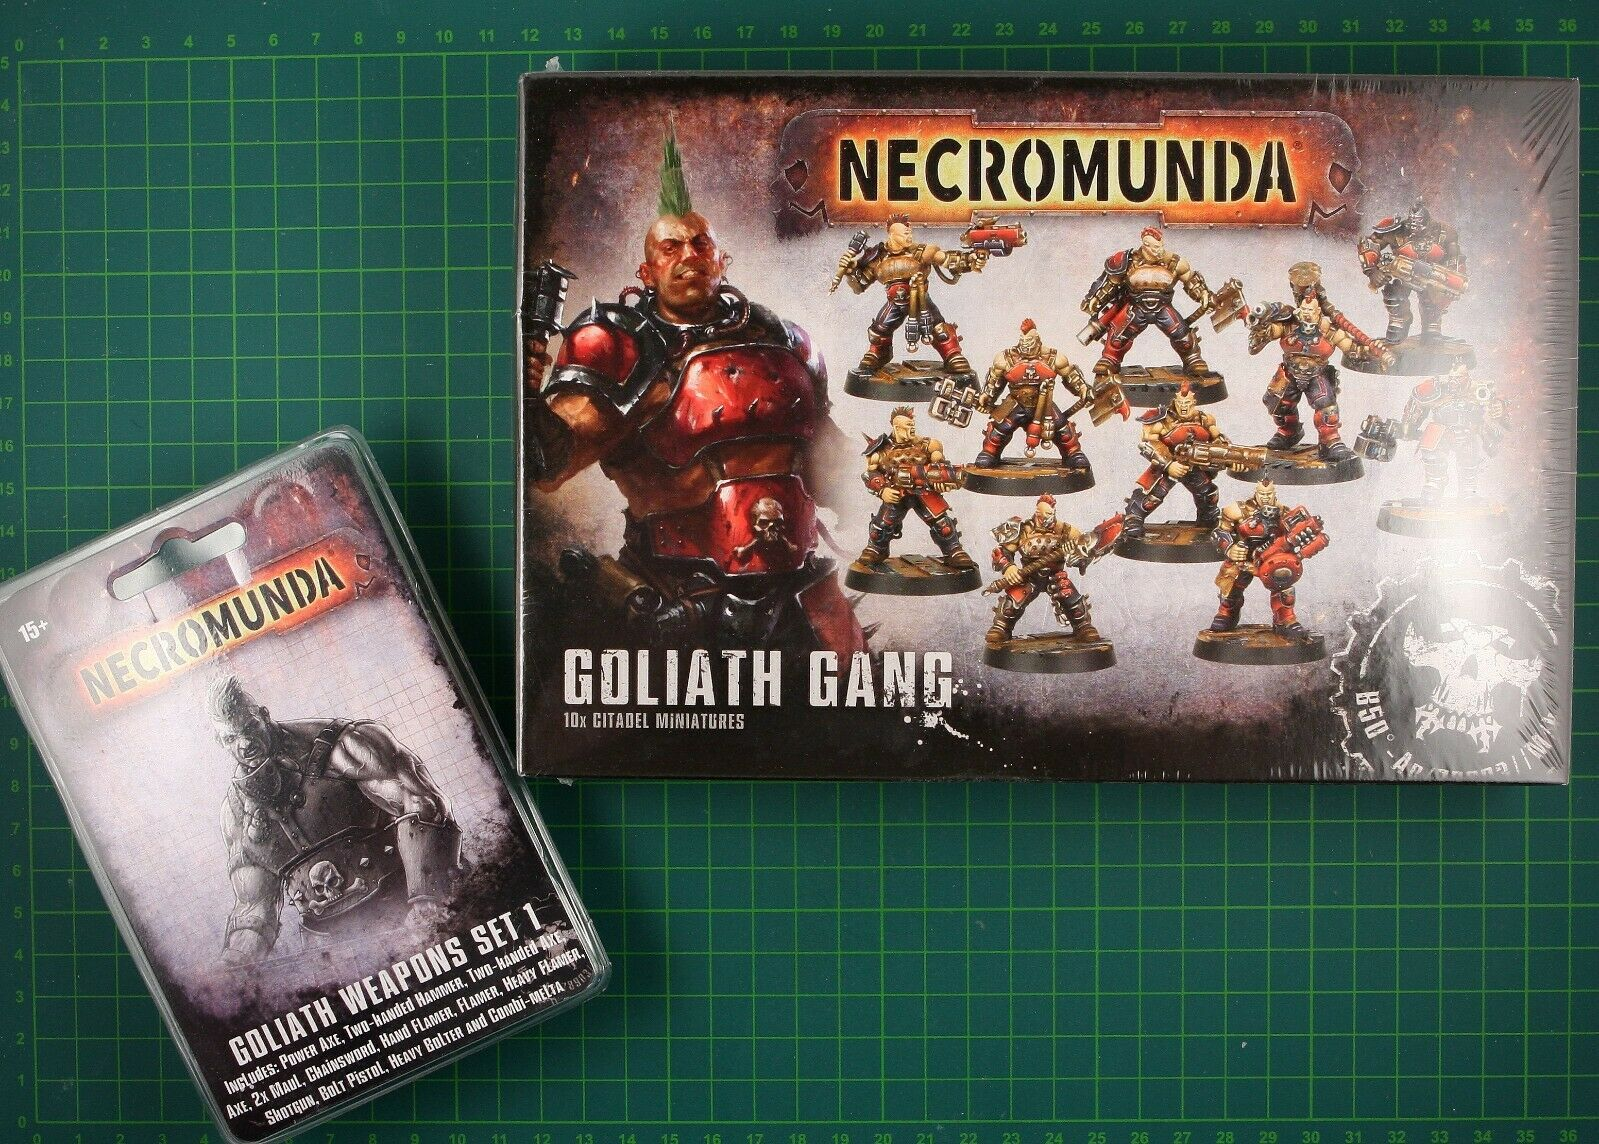 Goliath Gang Boîte + Goliath Weapons Set 1 Forge Monde Necromunda 11919